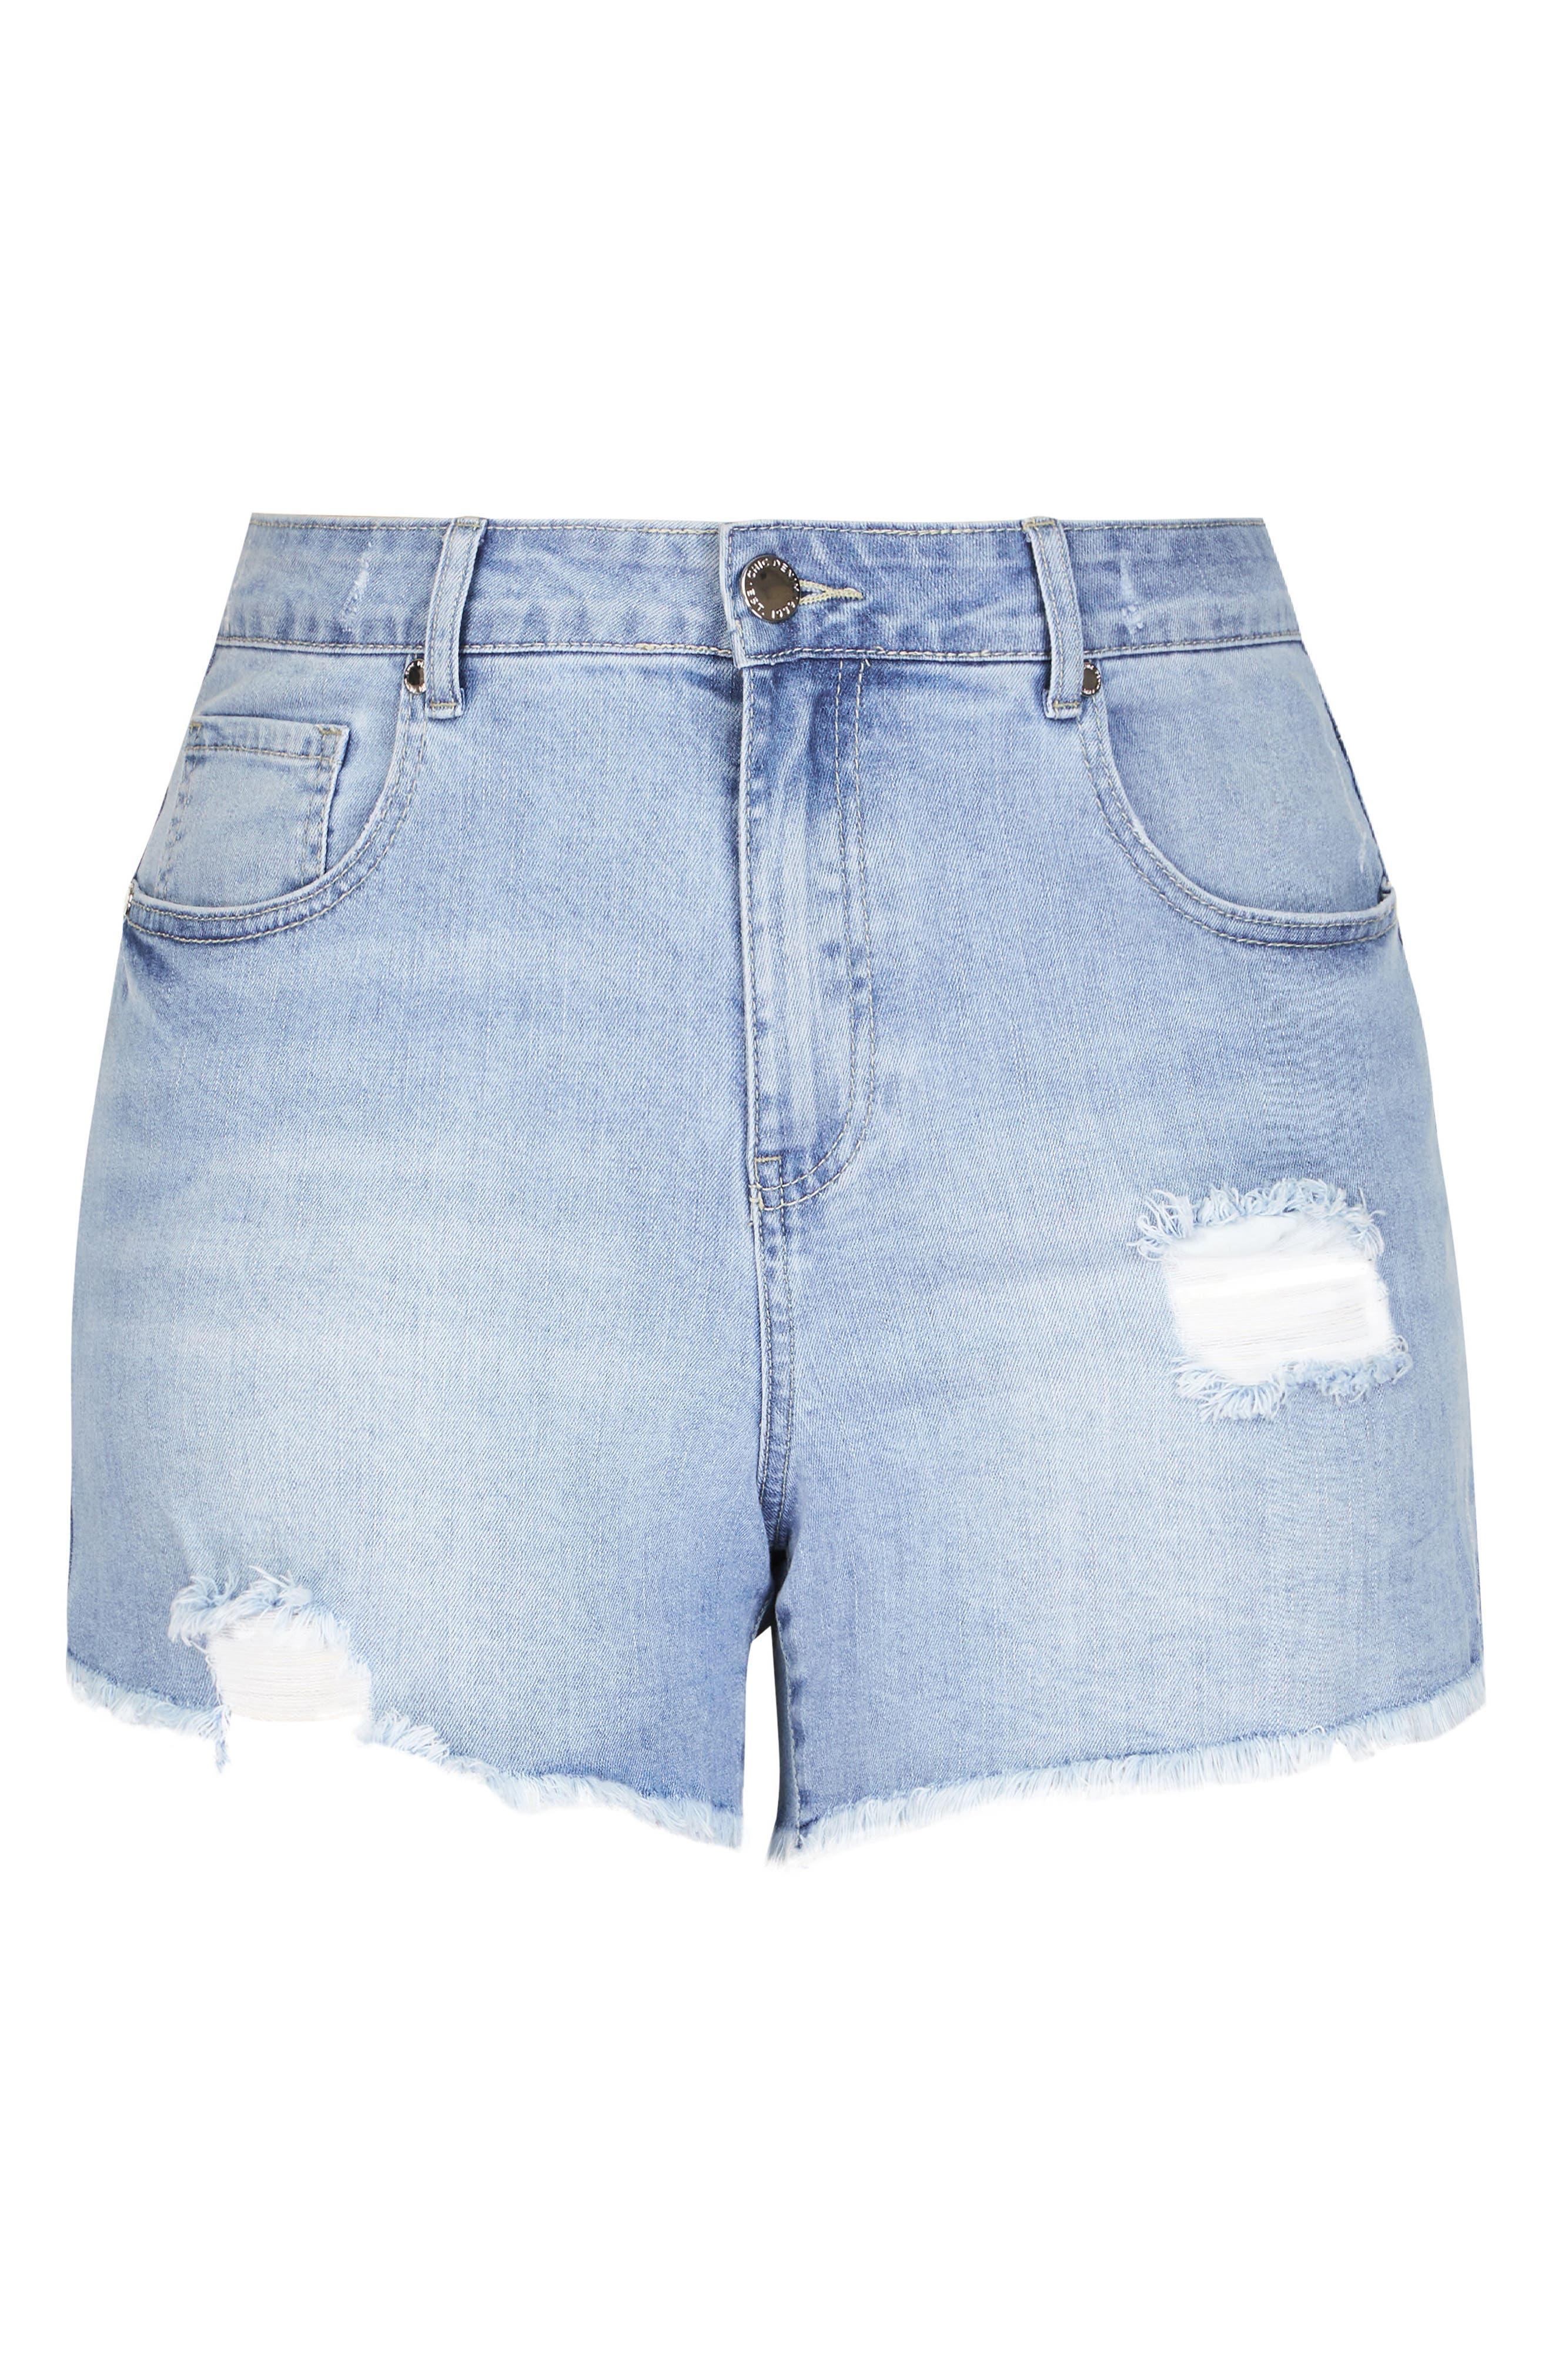 Sweet Cut Out Denim Shorts,                             Alternate thumbnail 3, color,                             401